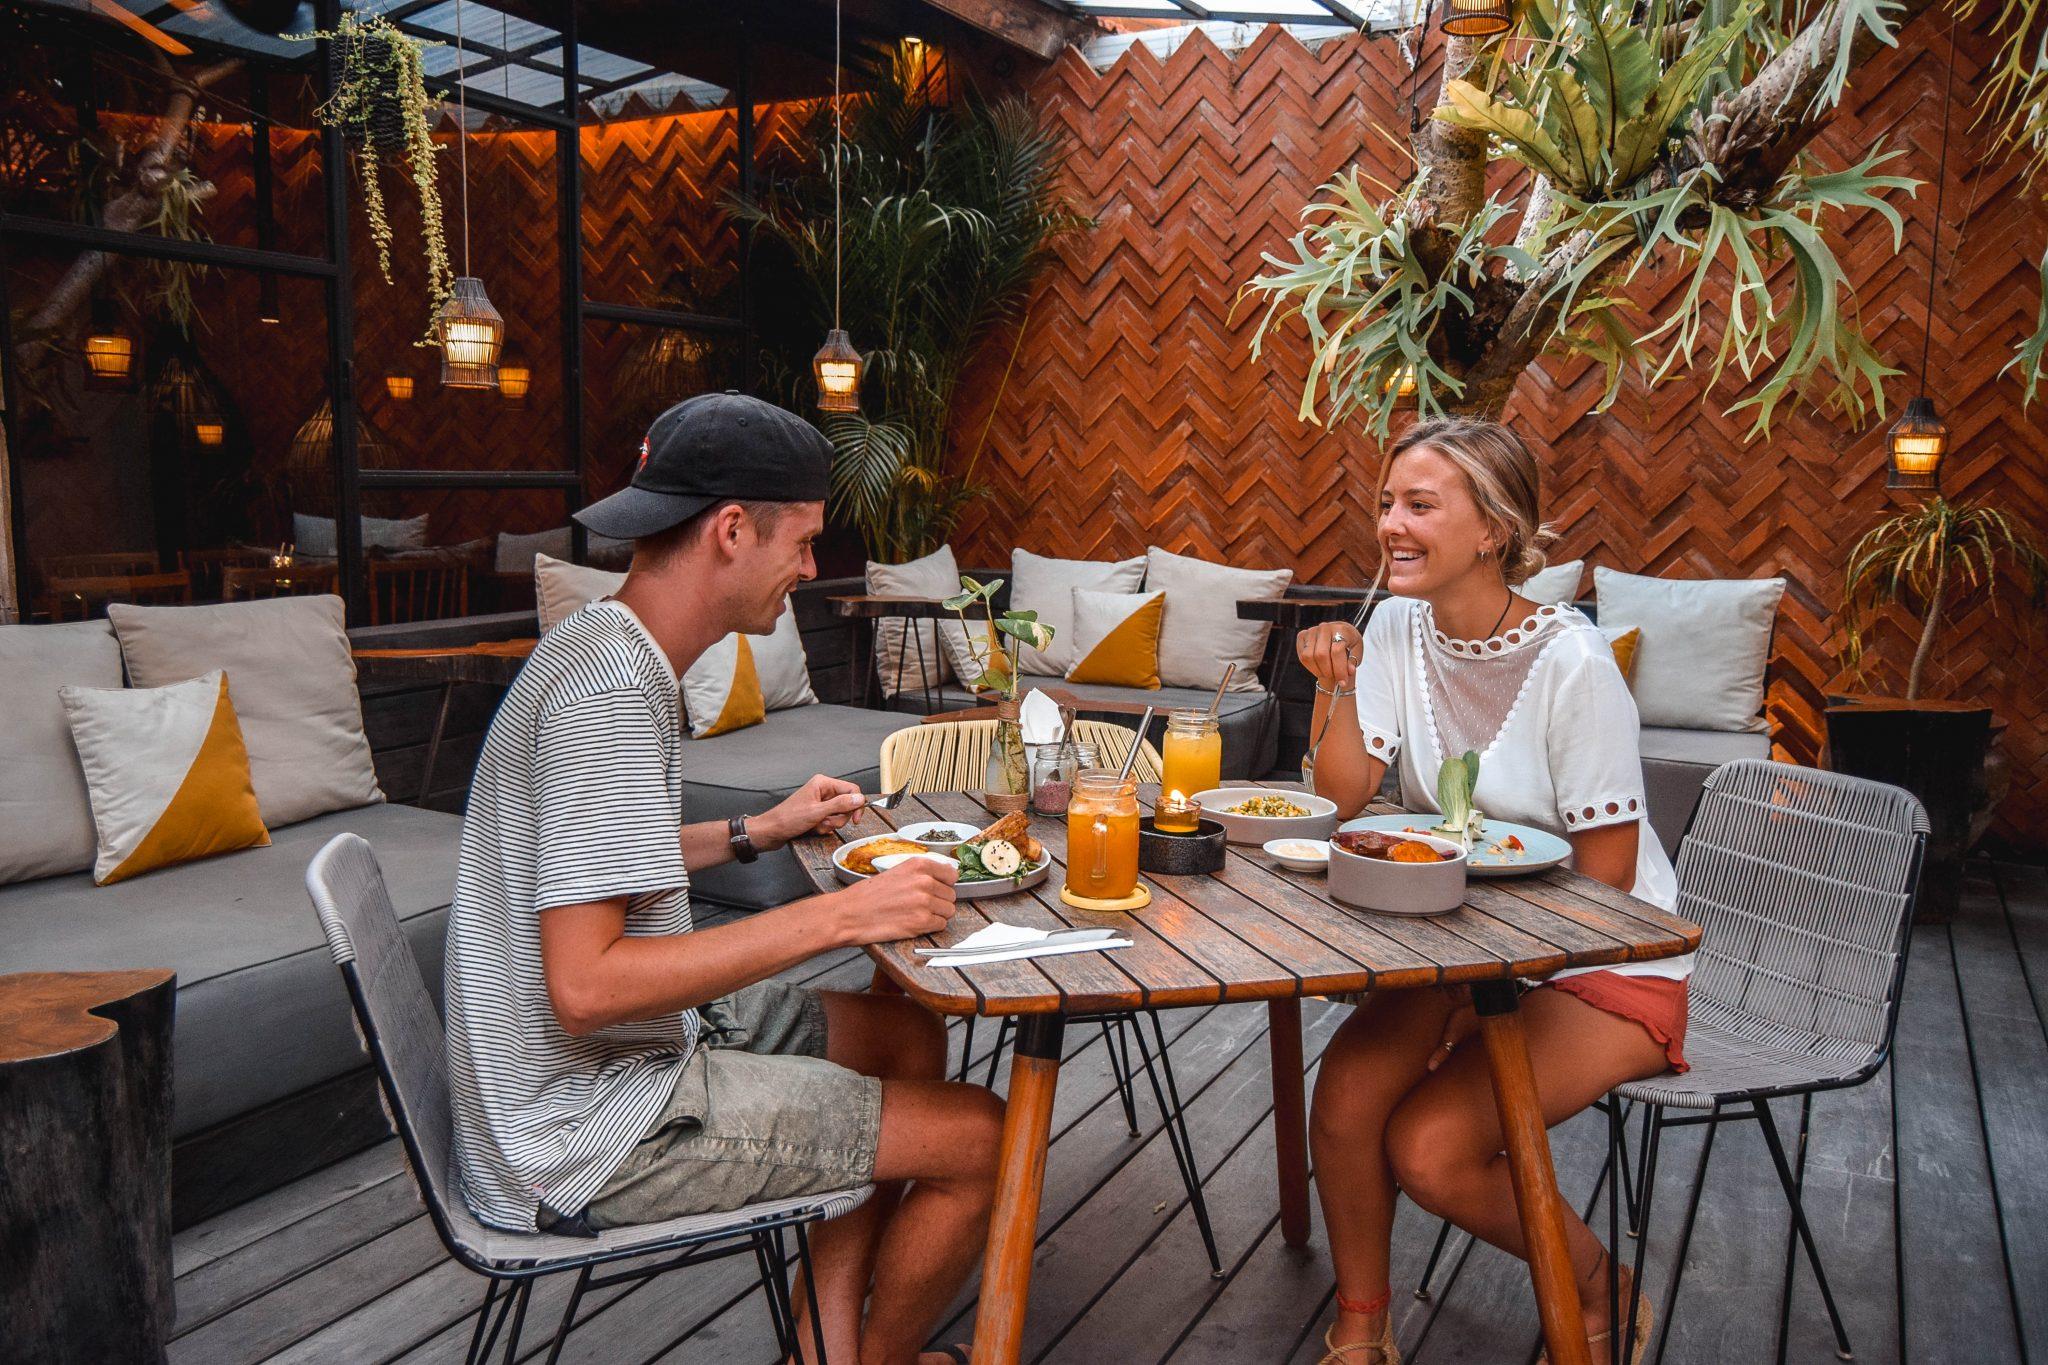 Wanderers & Warriors - Charlie & Lauren UK Travel Couple - The Savage Kitchen Bali Berawa Canggu Bali - Best Restaurants In Bali Restaurants - Best Restaurants In Canggu